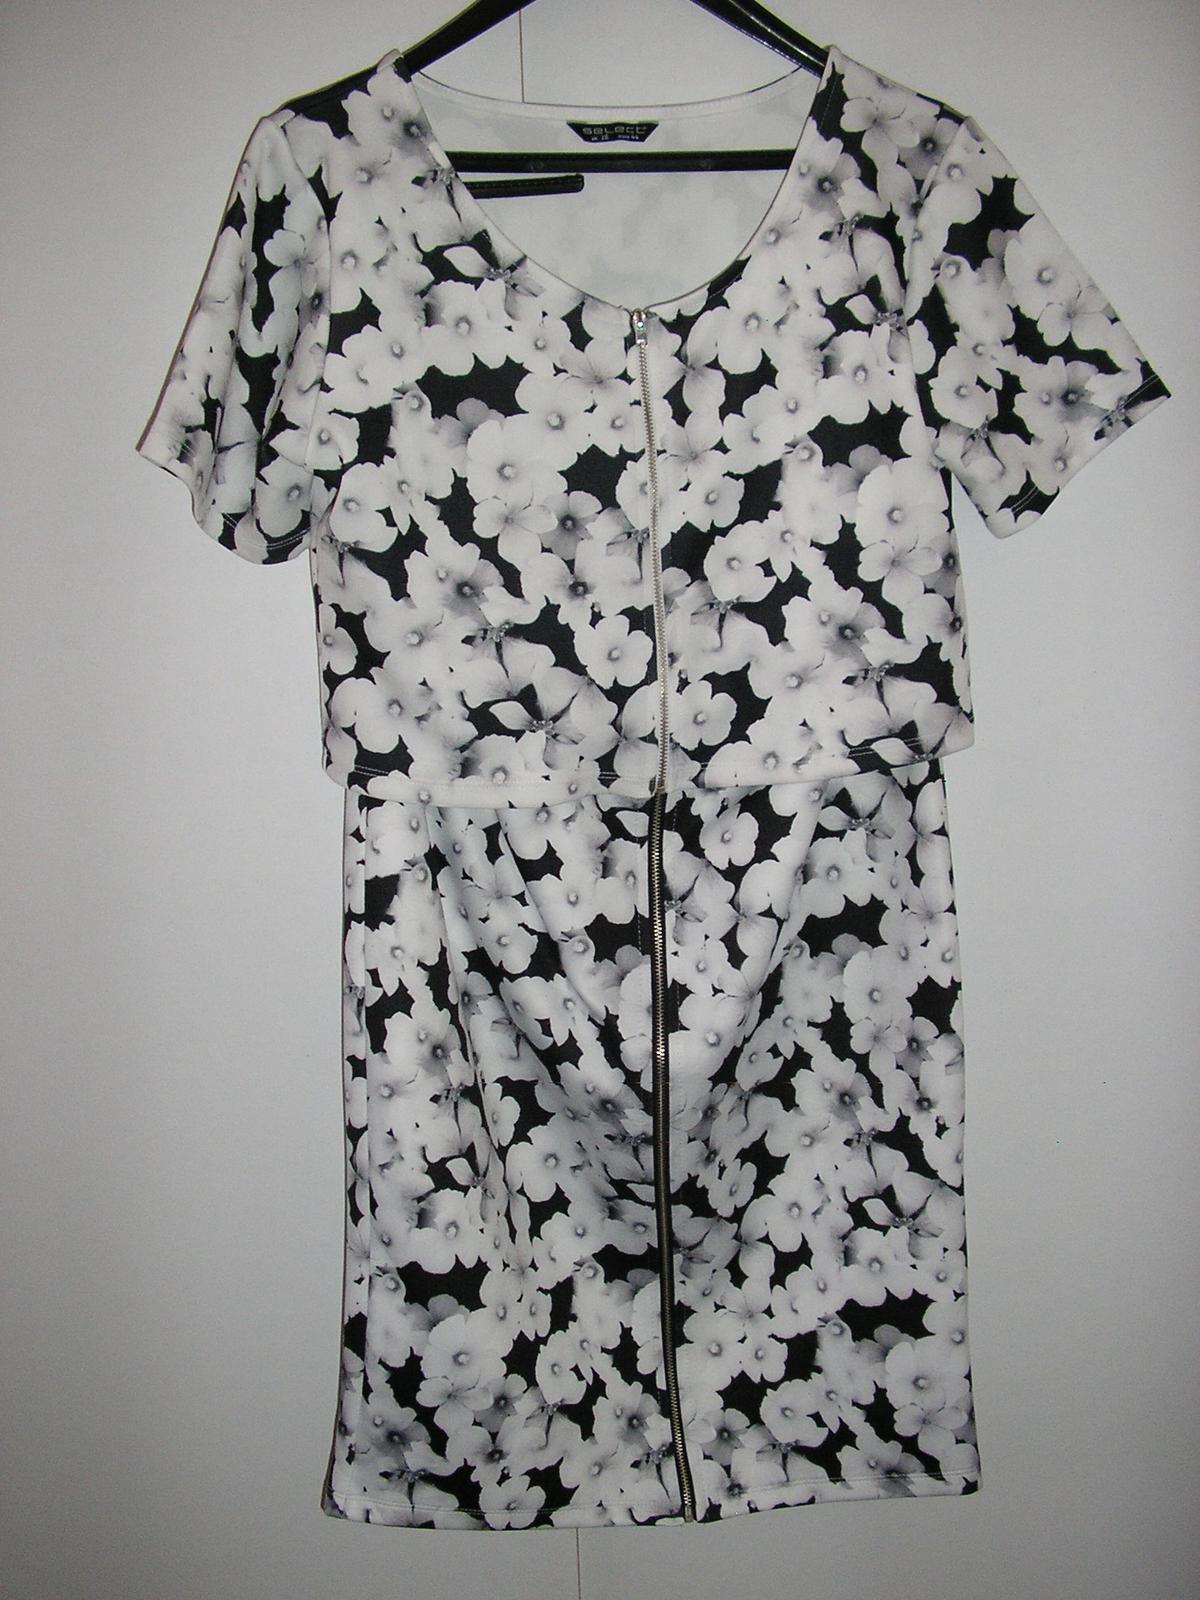 397. Select dvojdielné šaty  - Obrázok č. 1